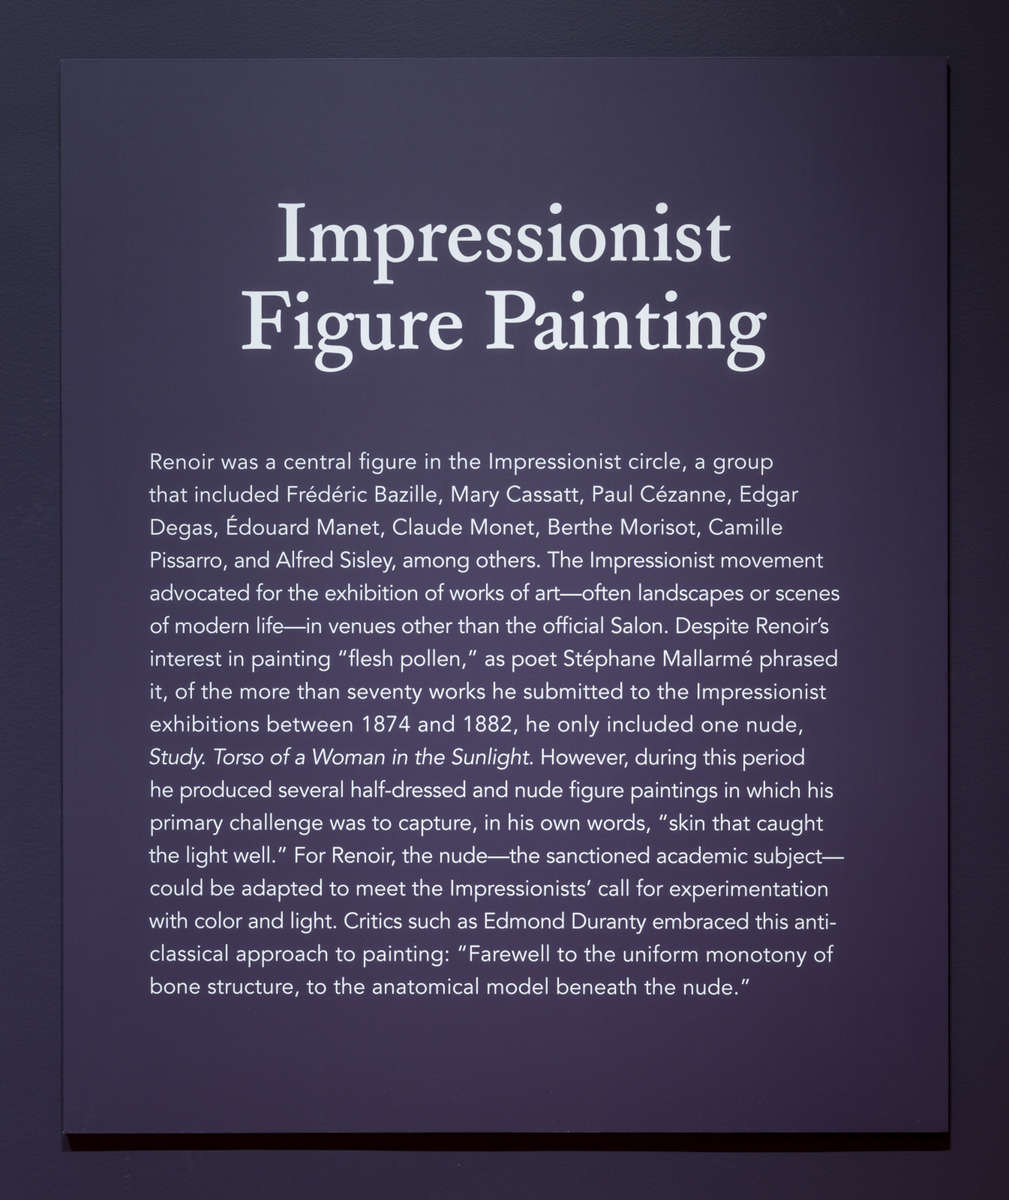 Renoir-The-Body-and-the-Senses-21